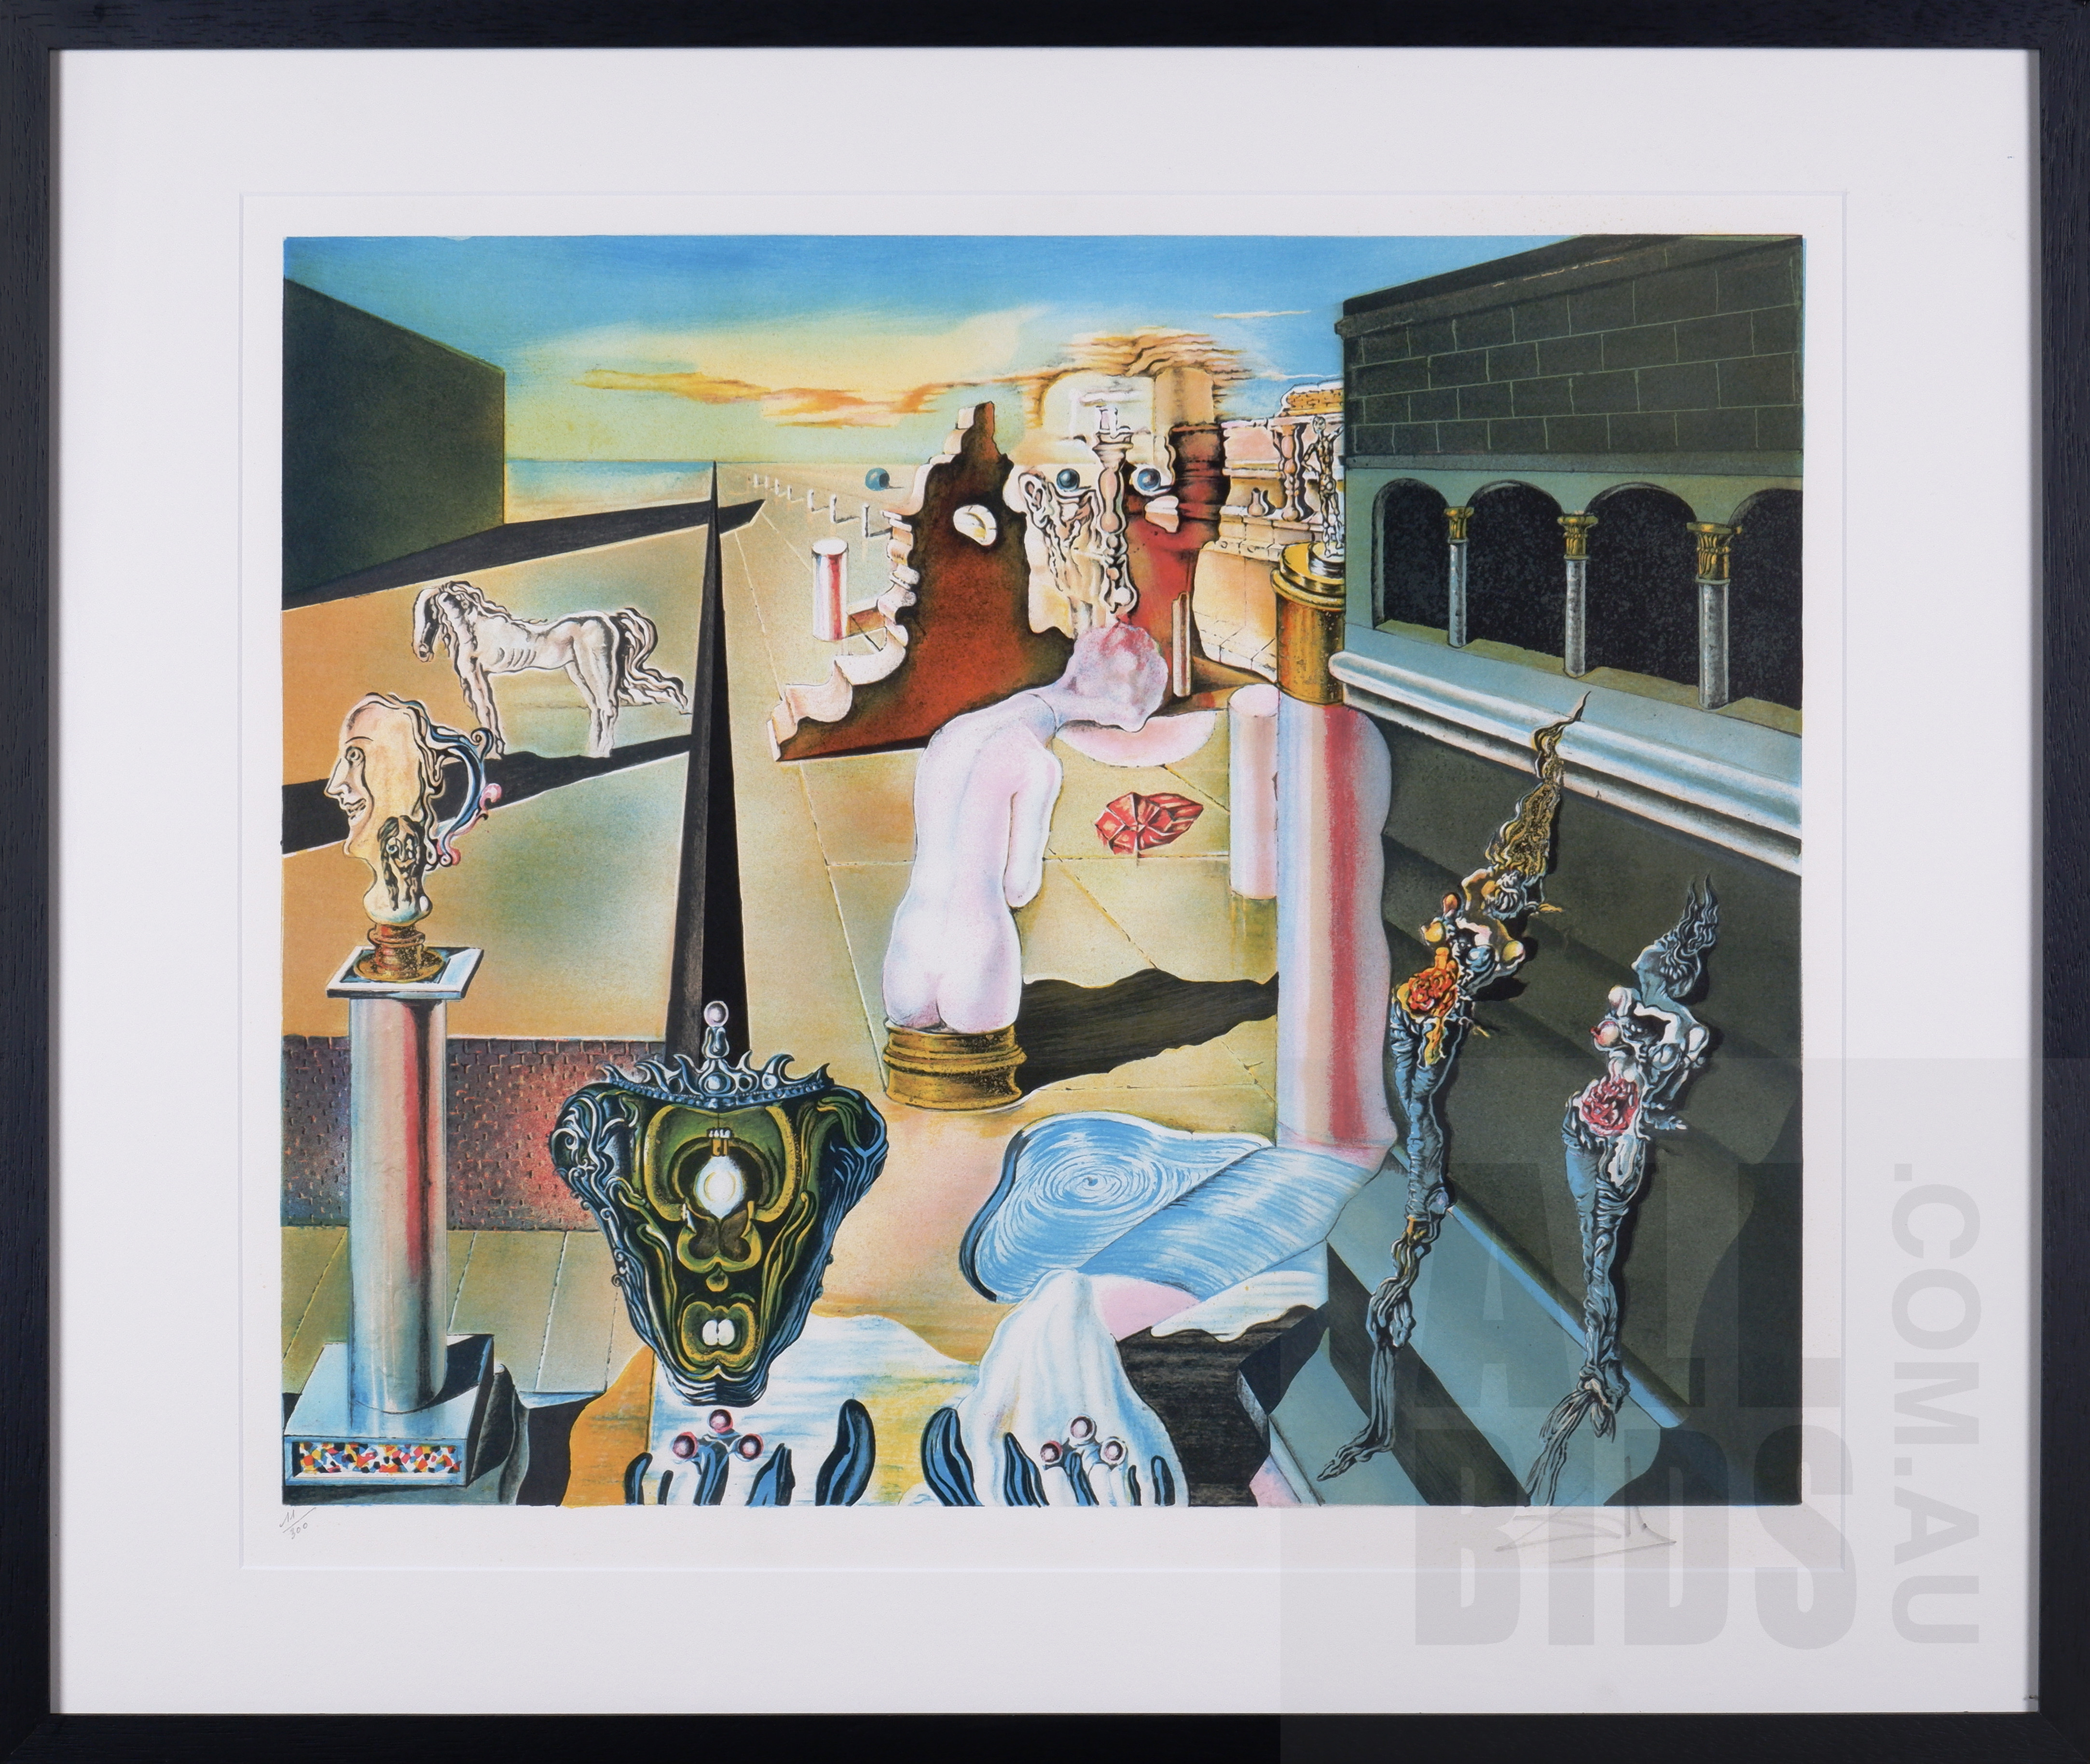 'Salvador Dali (1904-1989, Spanish), LHomme Invisible, Lithograph, 48 x 58.5 cm (image size)'